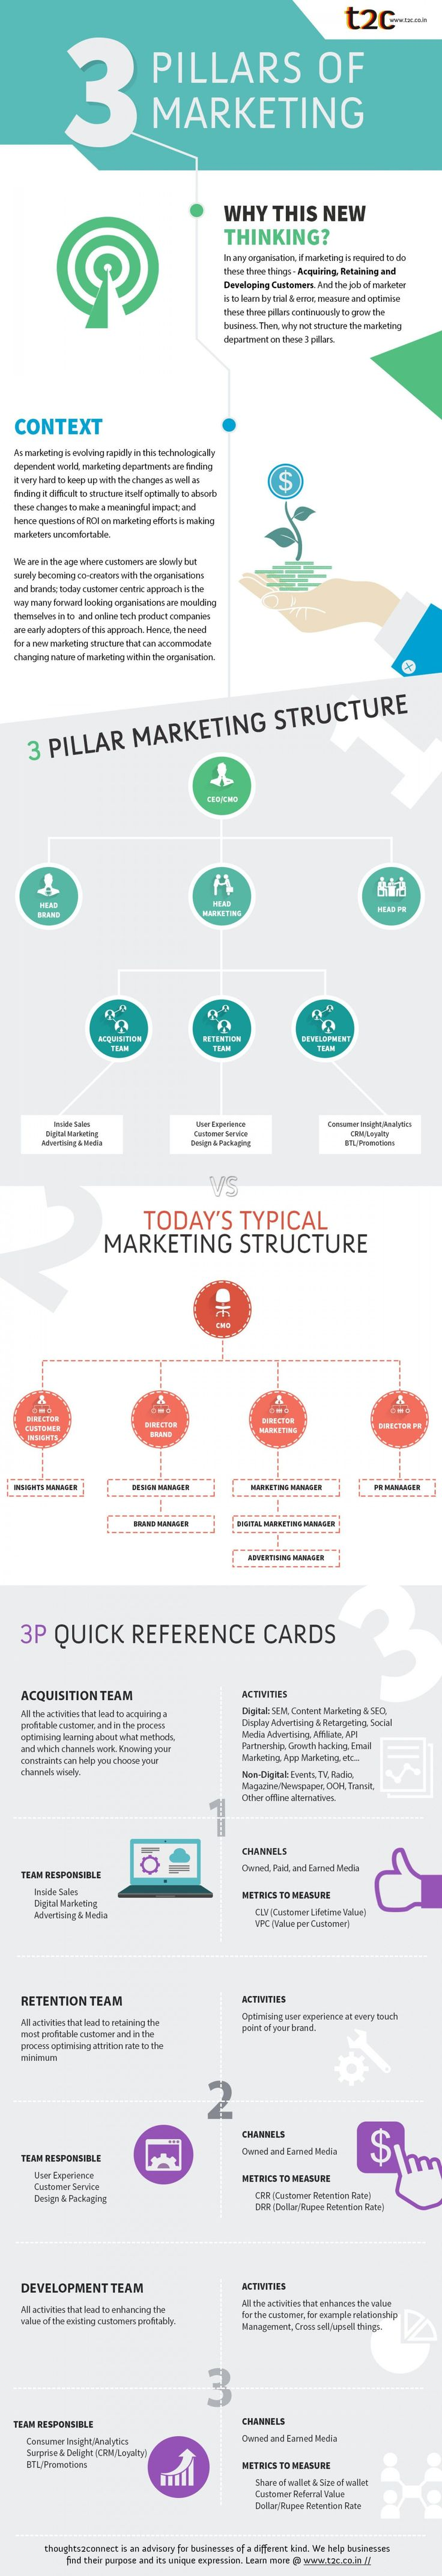 #Marketing #Infographic: 3 Pillars of Marketing